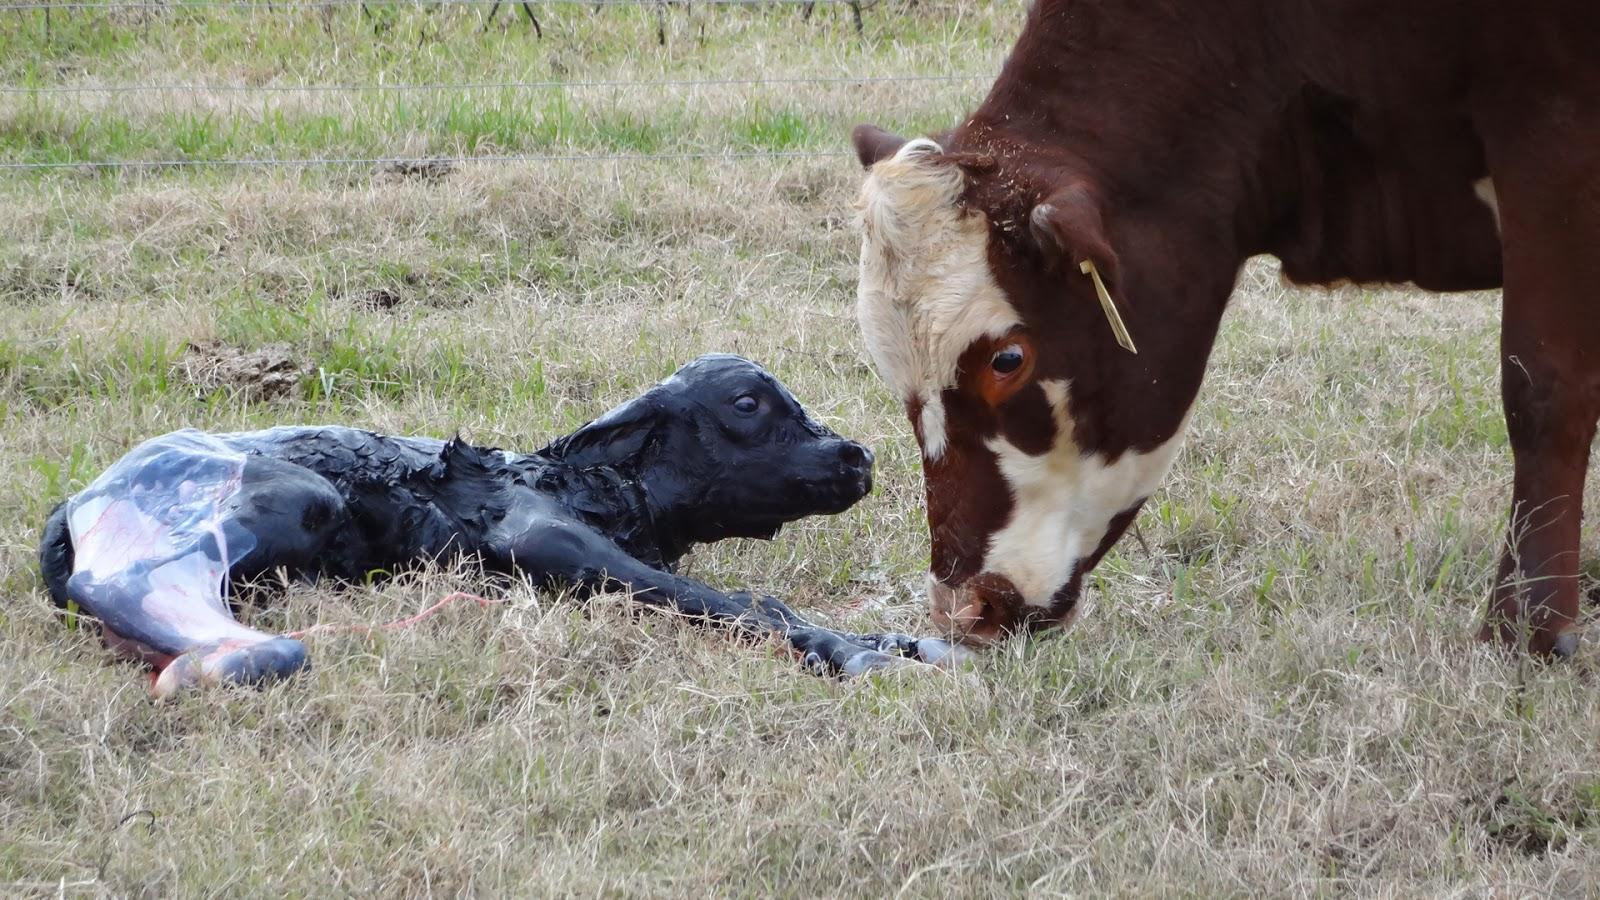 Cows giving birth - photo#14